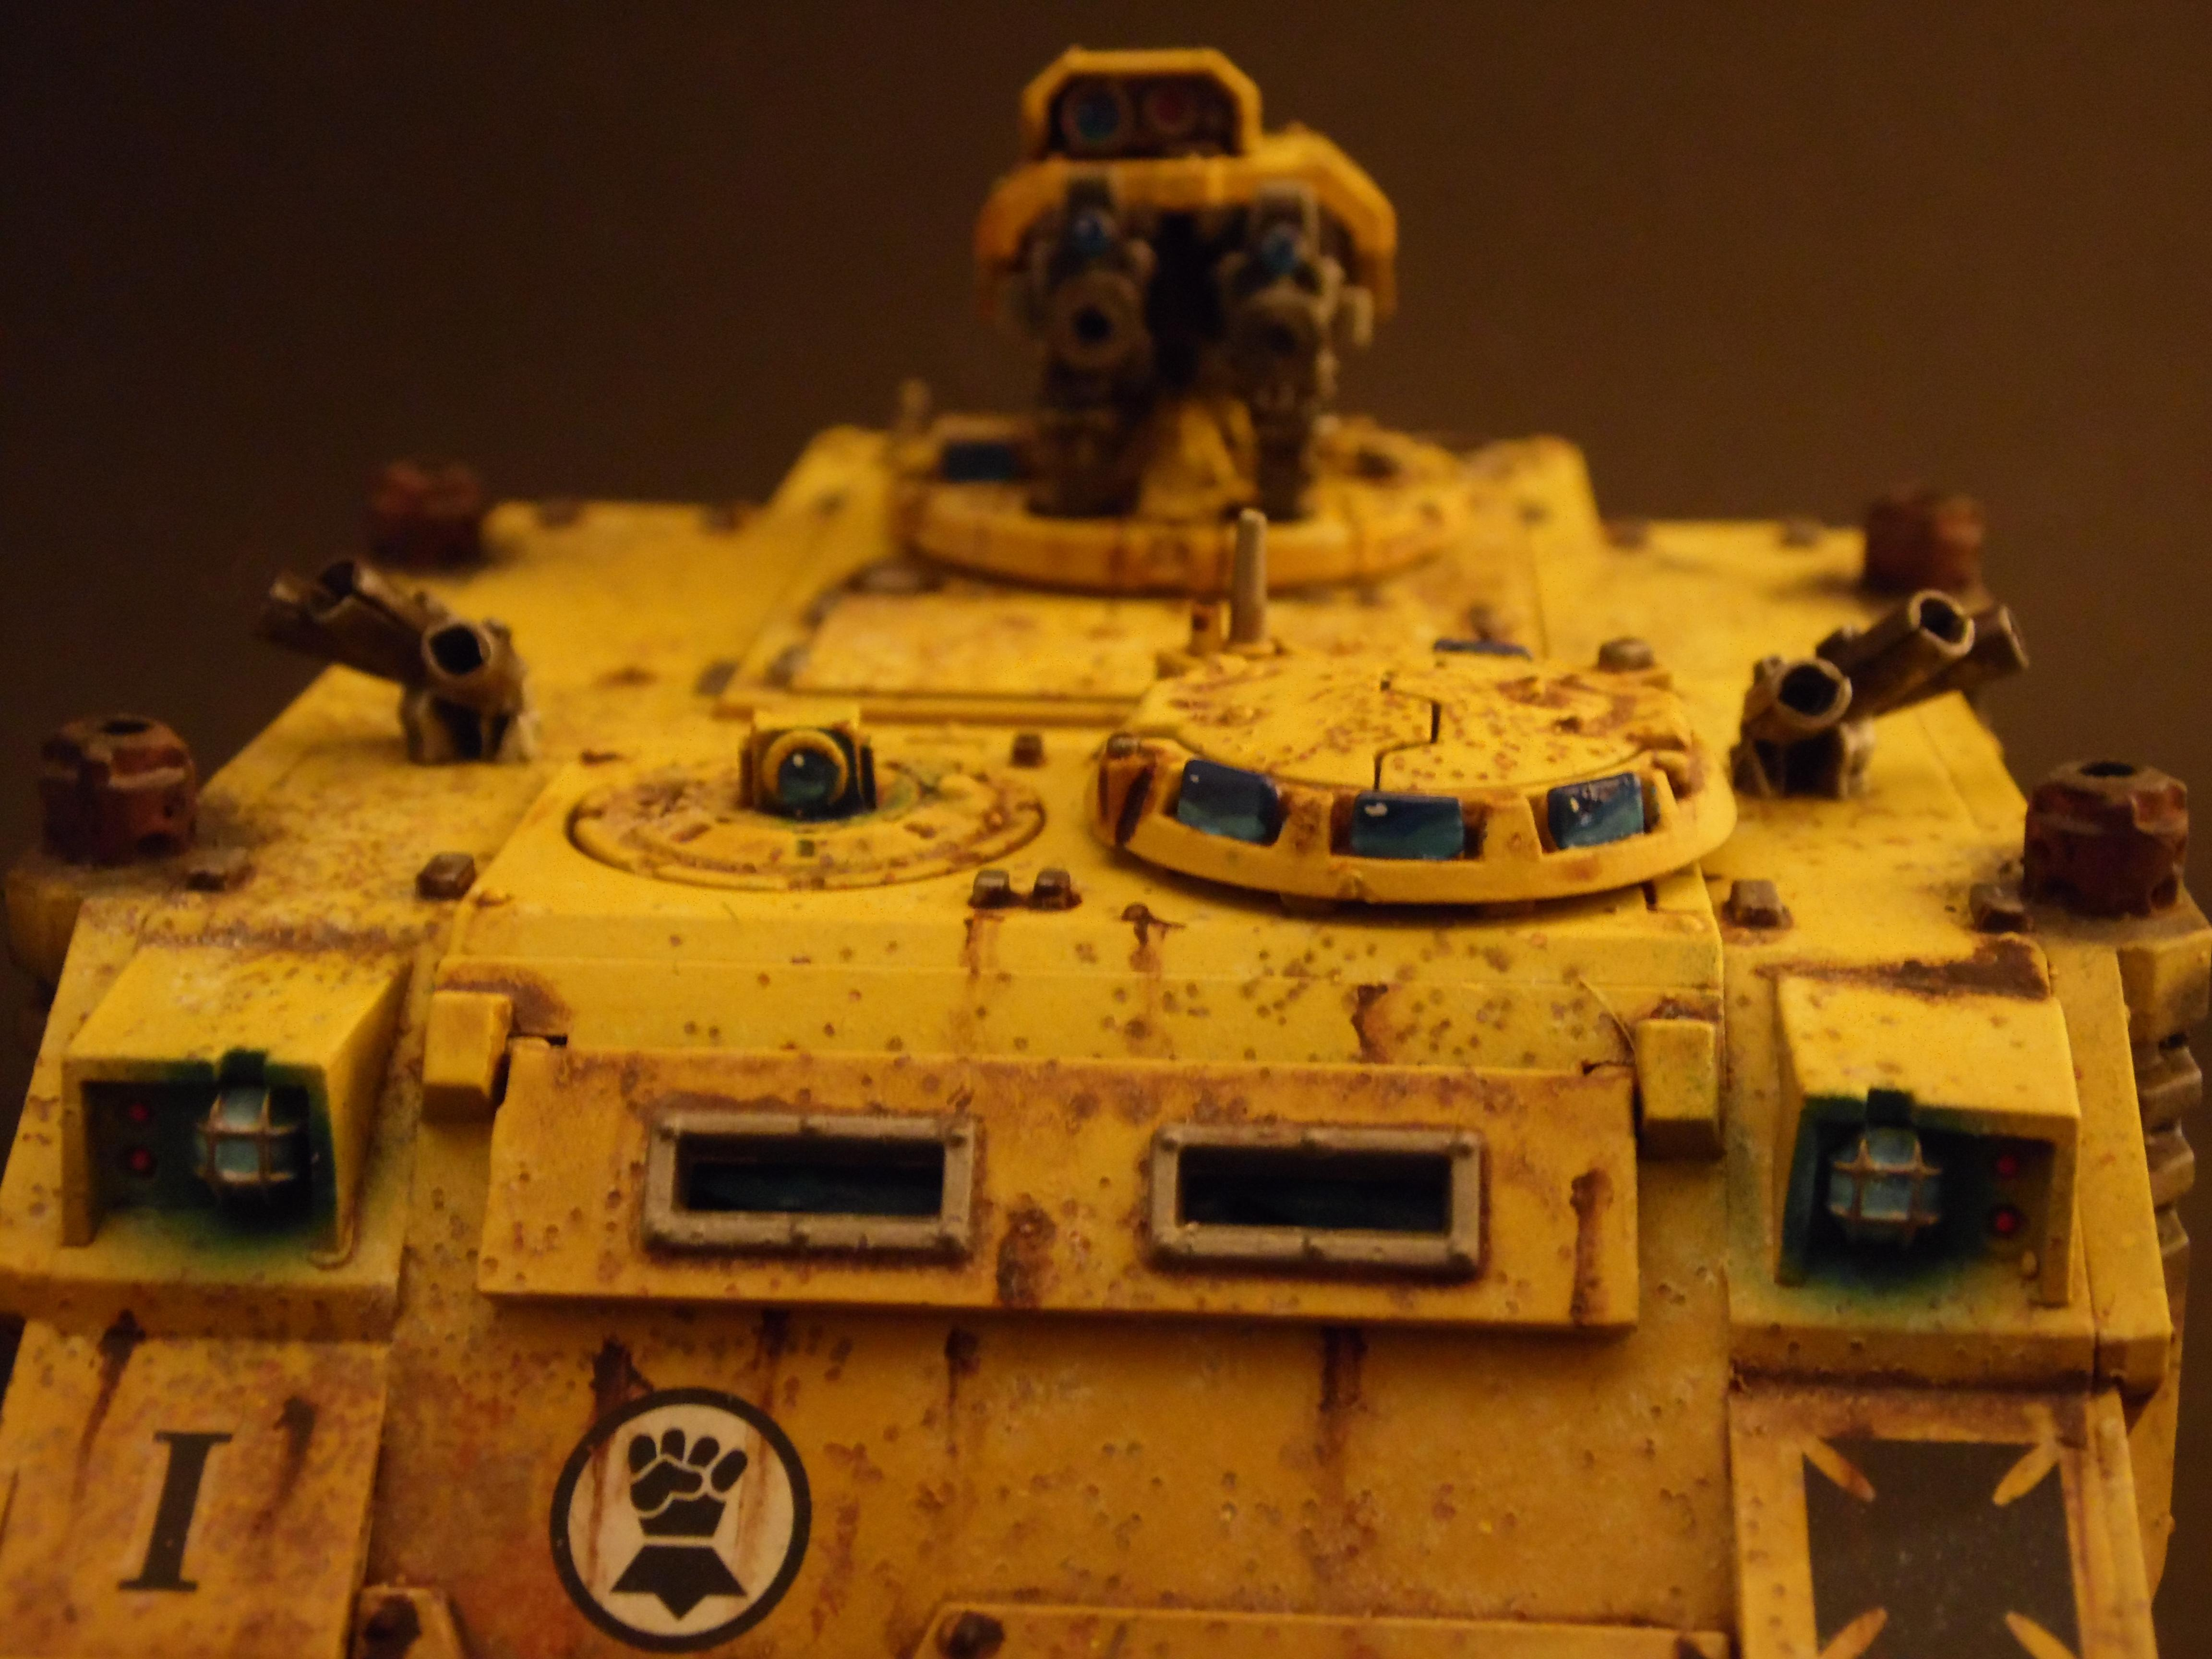 Fist, Fist Razorback, Imperial, Painting, Rusty, Rustytankpainting, Tank, Warhammer 40,000